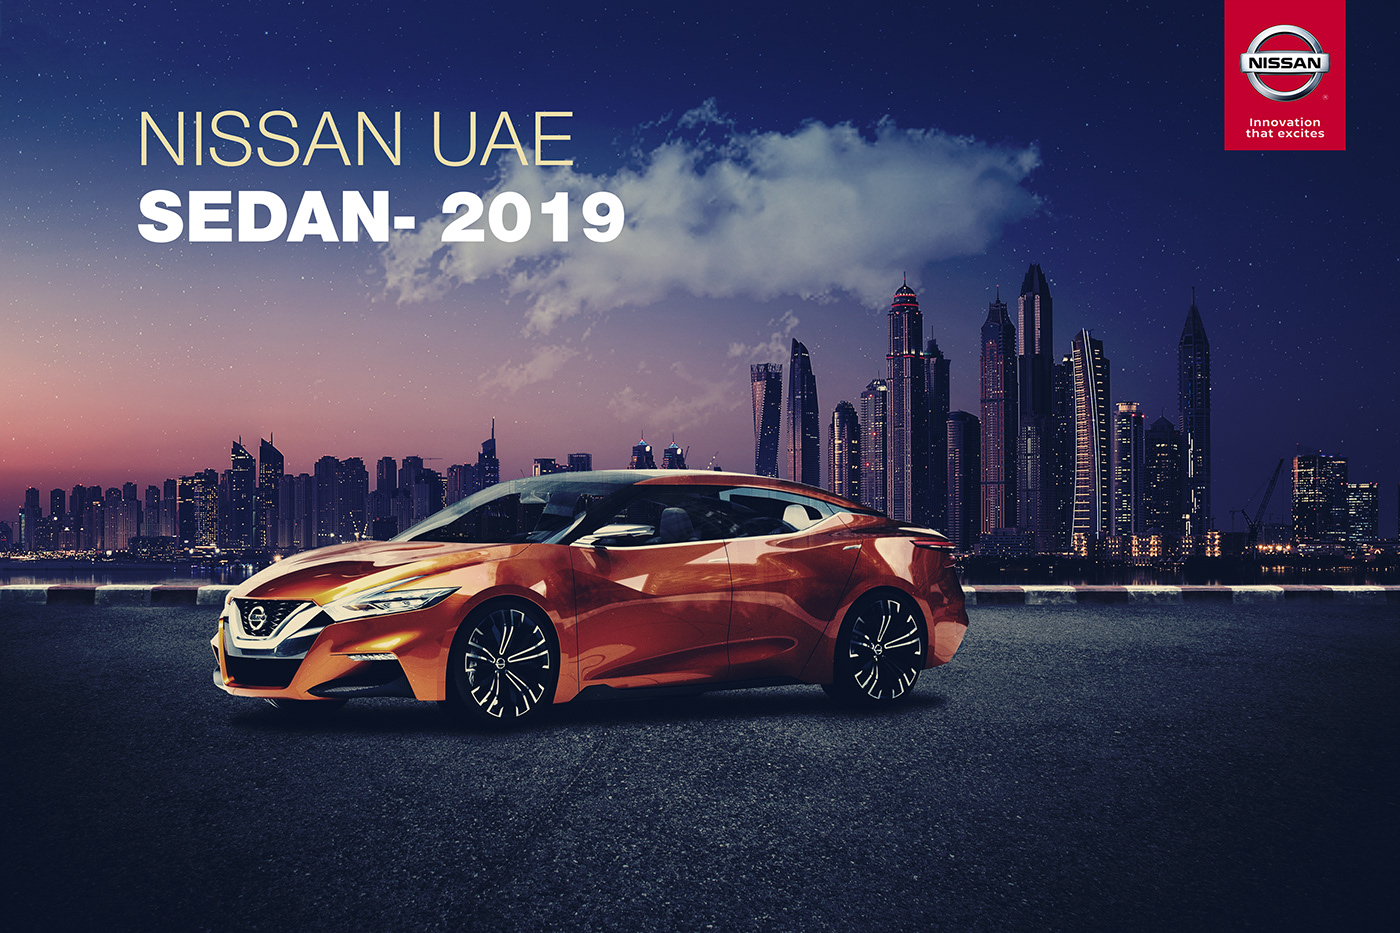 Nissan UAE - Campaign 2019 on Behance